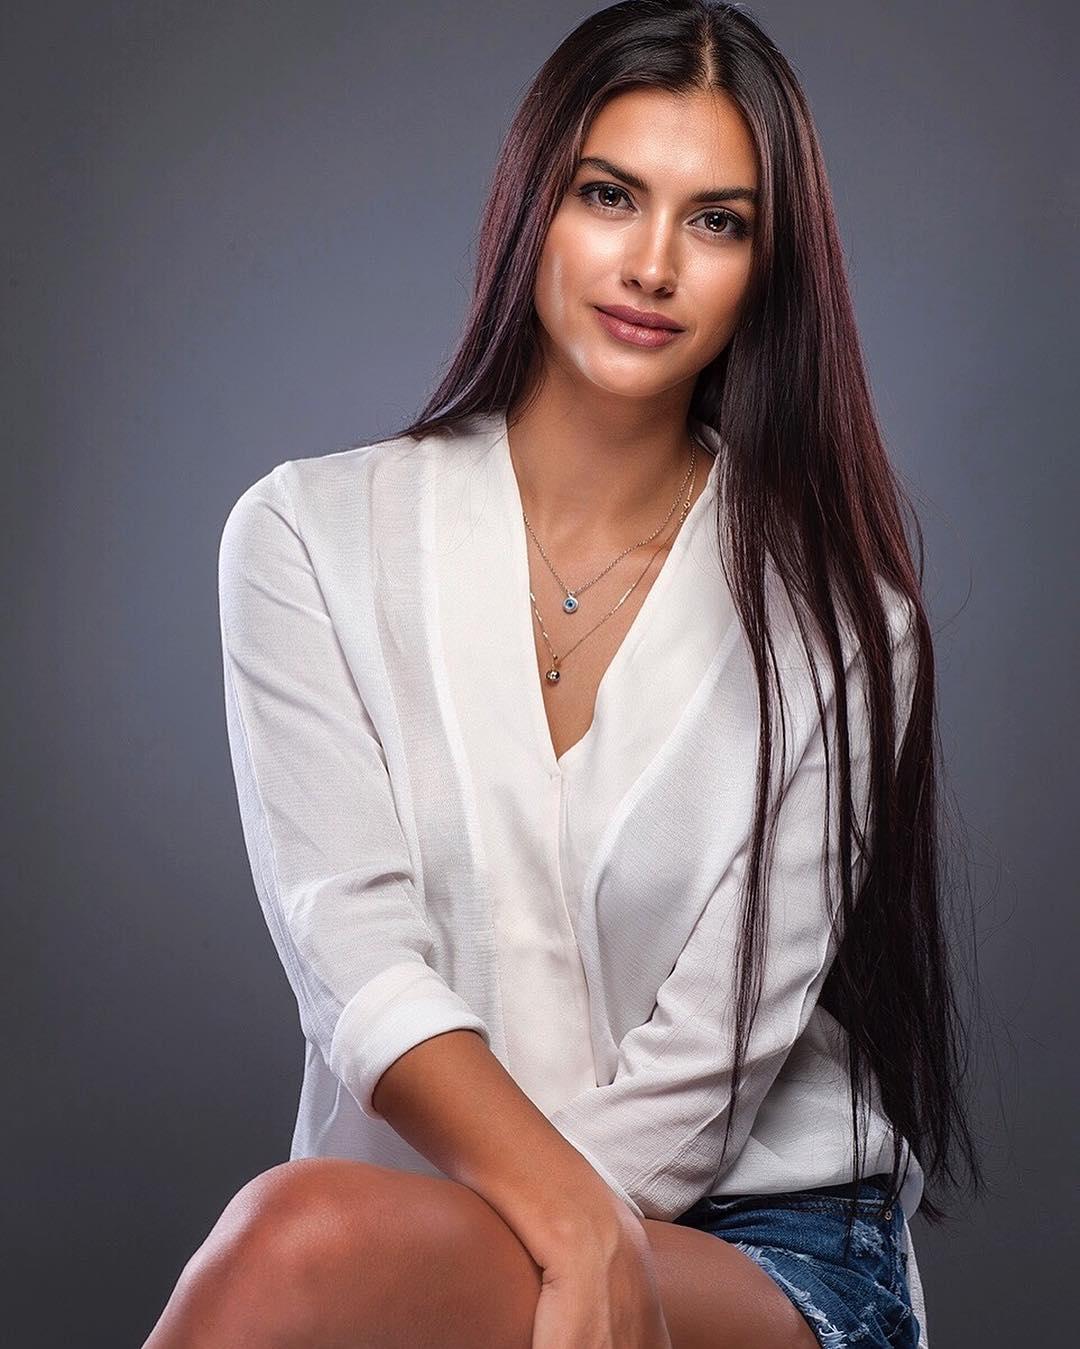 Miss Universe Turkey 2016  Tansu Sila Cakir / Tansu Sıla Çakır